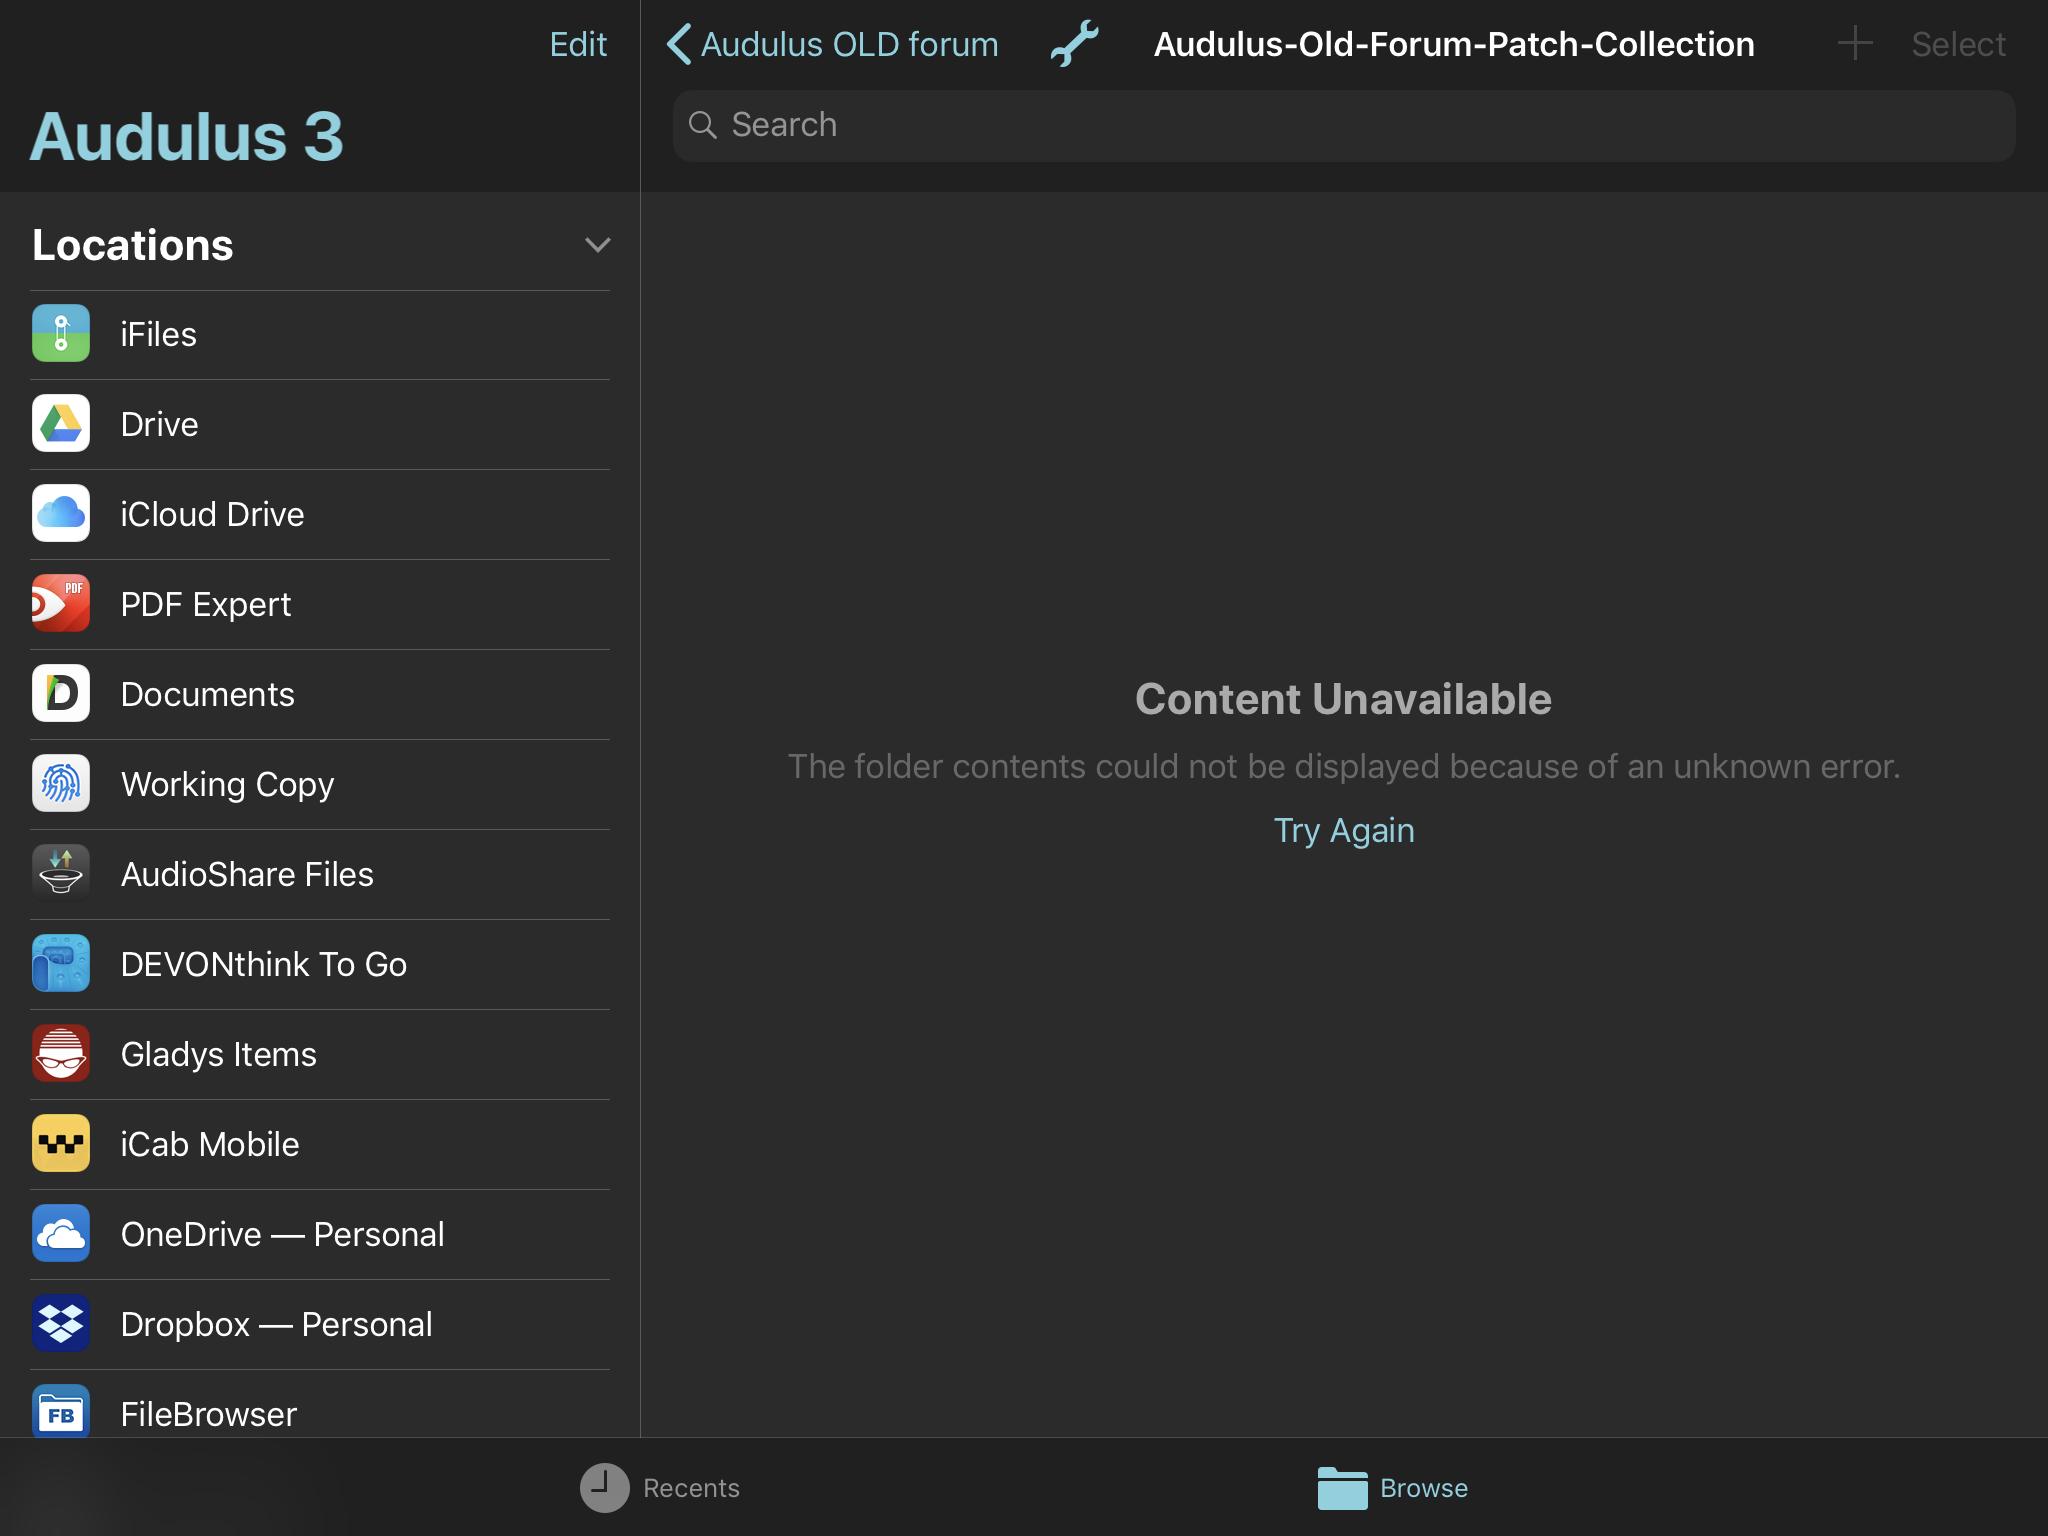 Audulus Update with METAL - Performance better? — Audiobus Forum